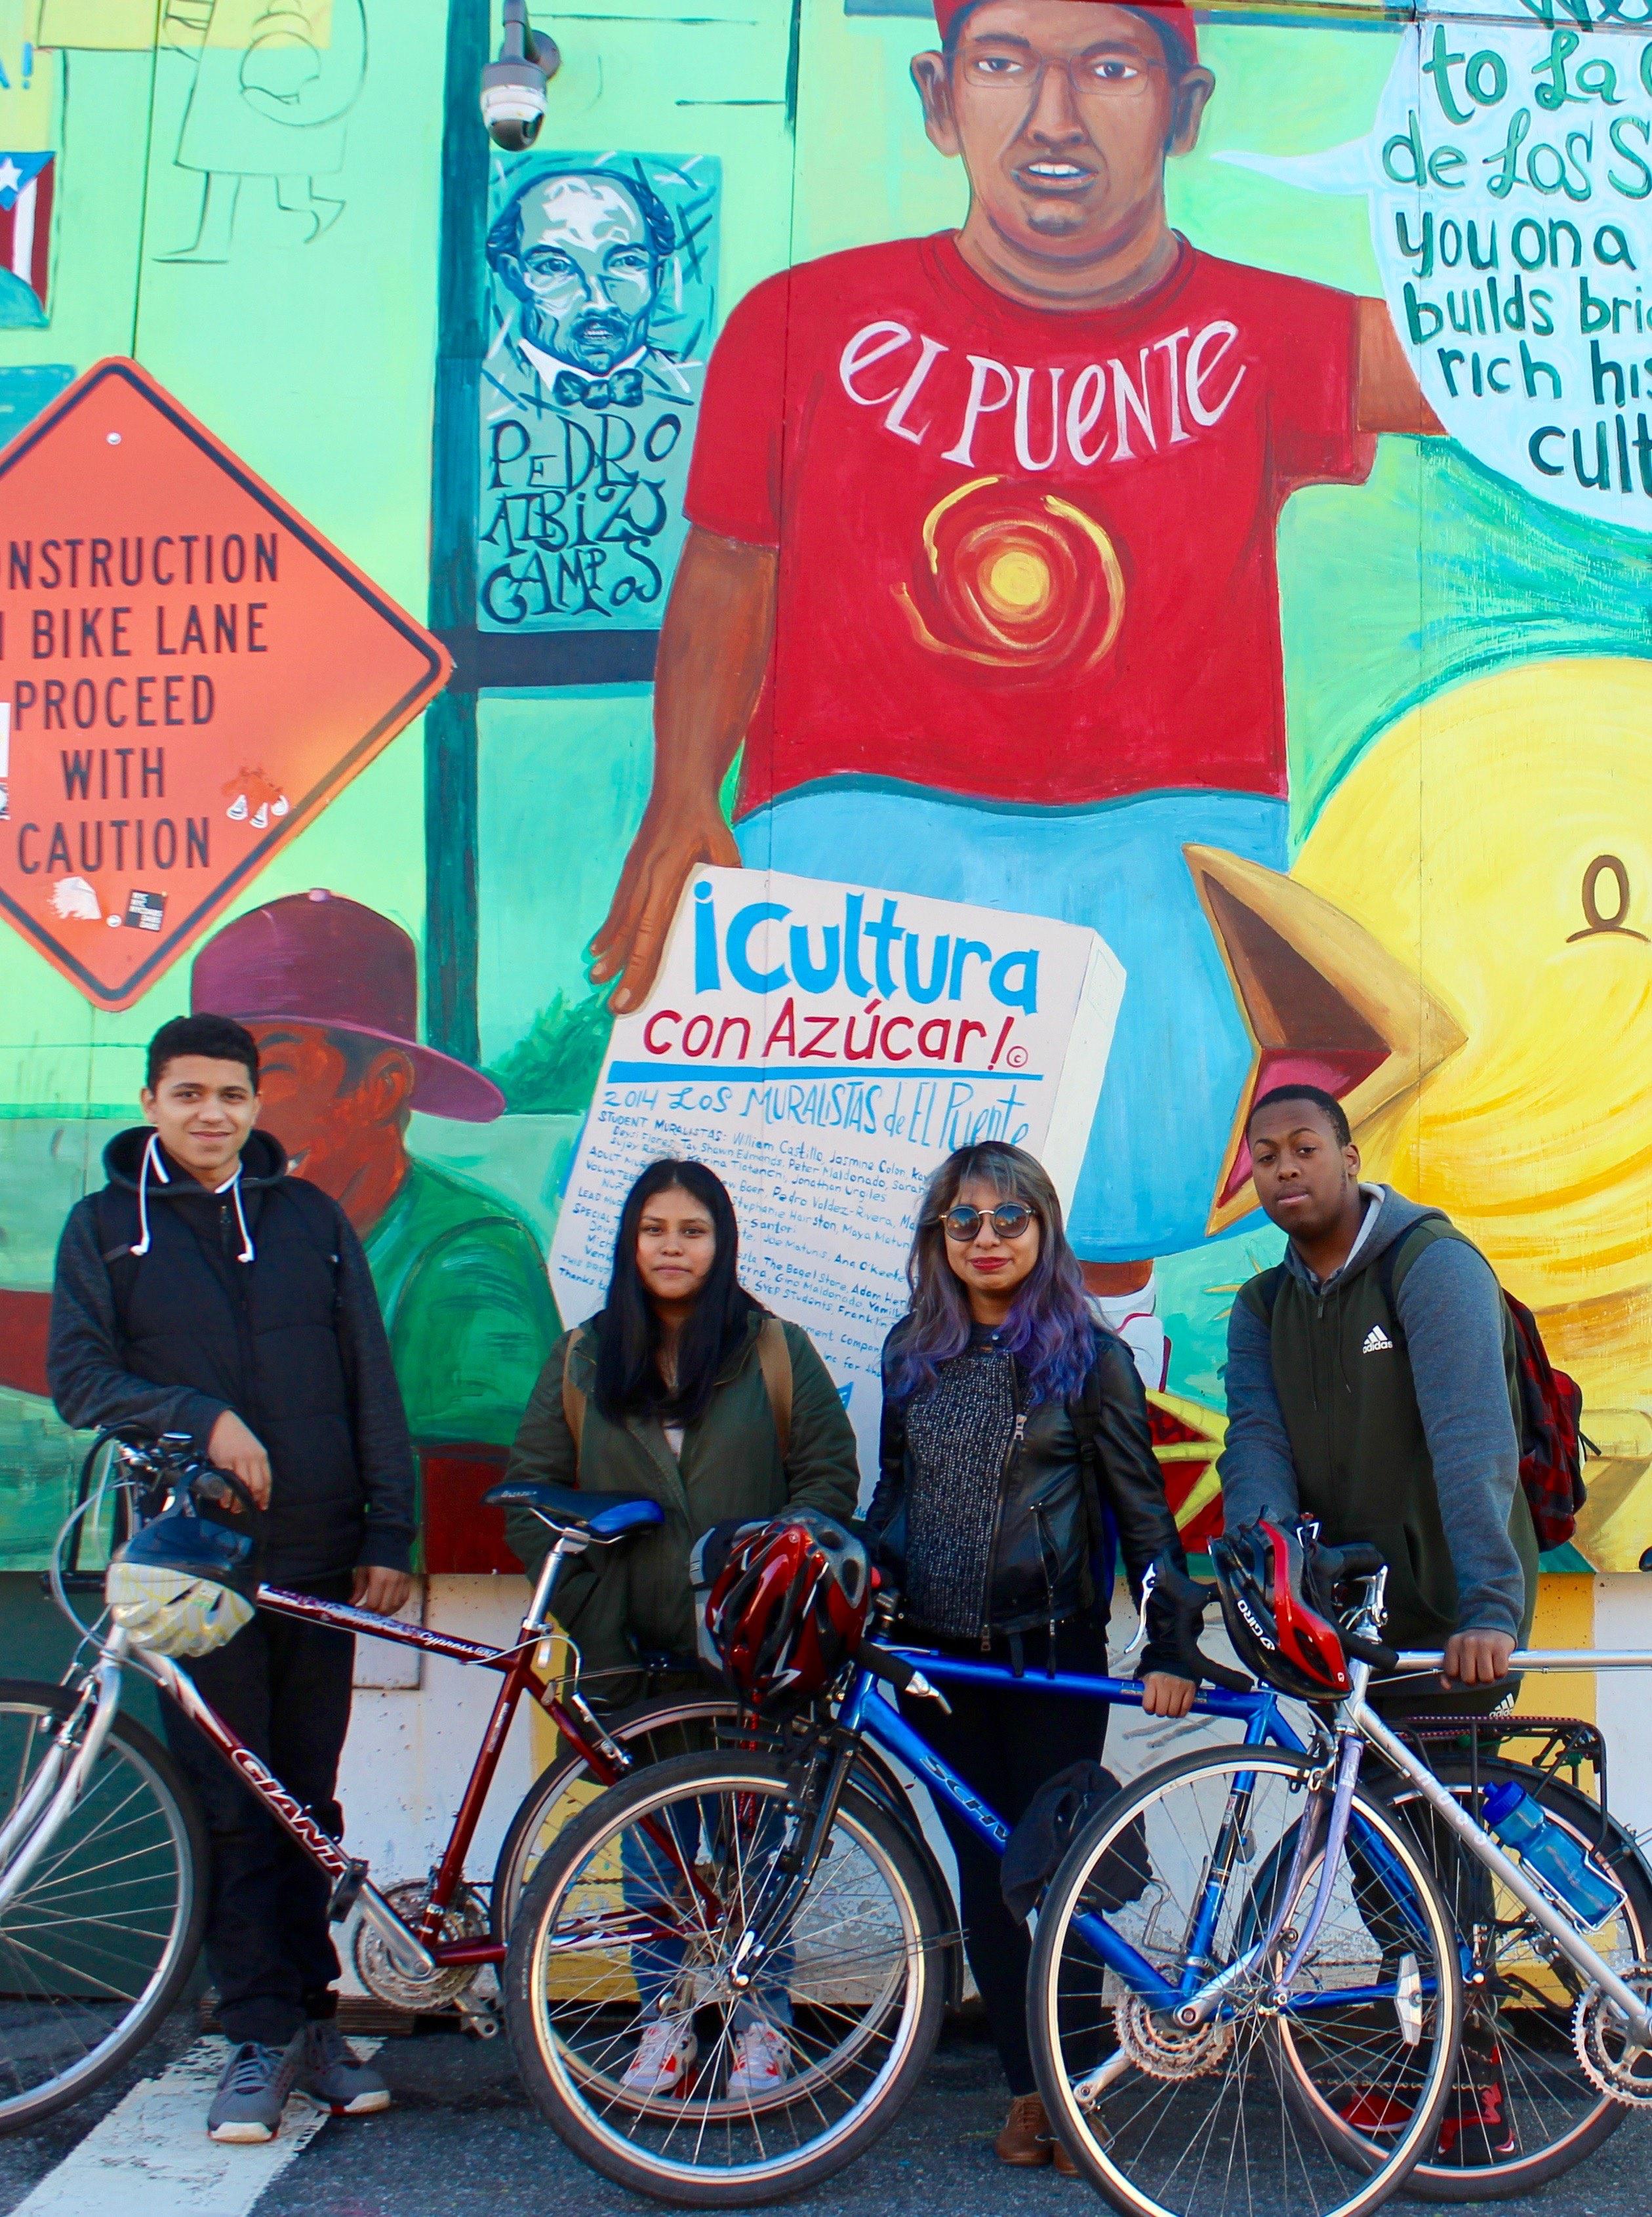 Members of El Puente Cycling Club with the mural Cultura con Azucar!